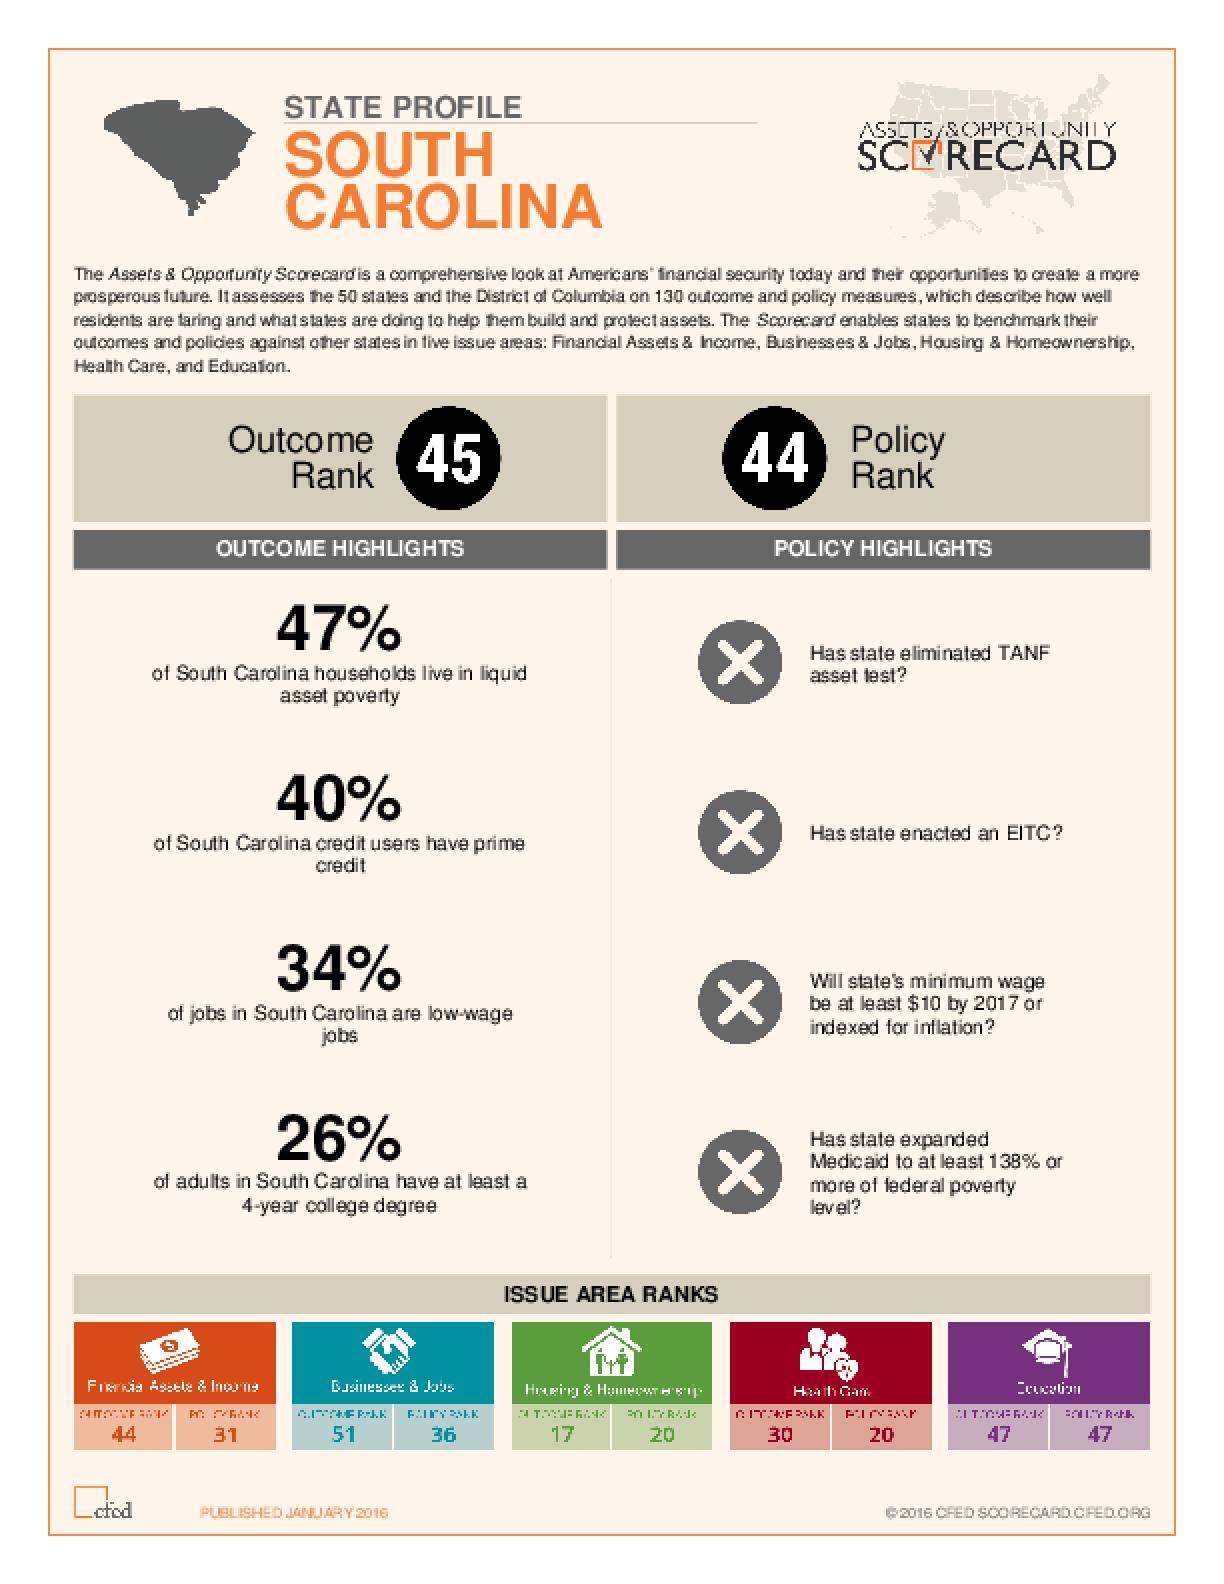 State Profile South Carolina: Assets and Opportunity Scorecard